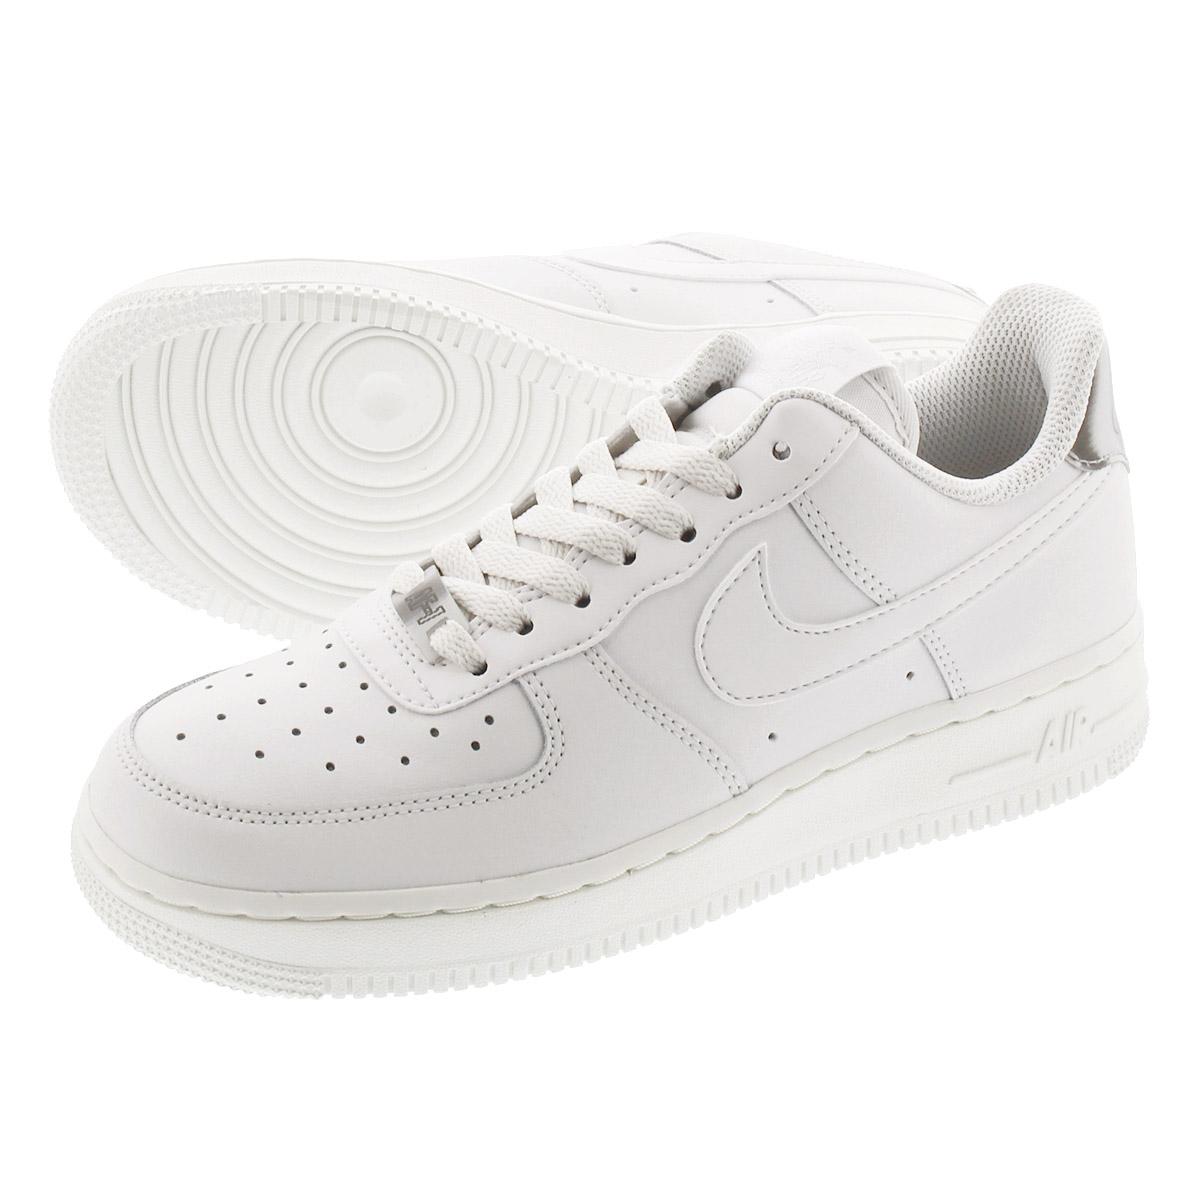 Nike Air Force 1 '07 Essential Platinum Tint AO2132 003